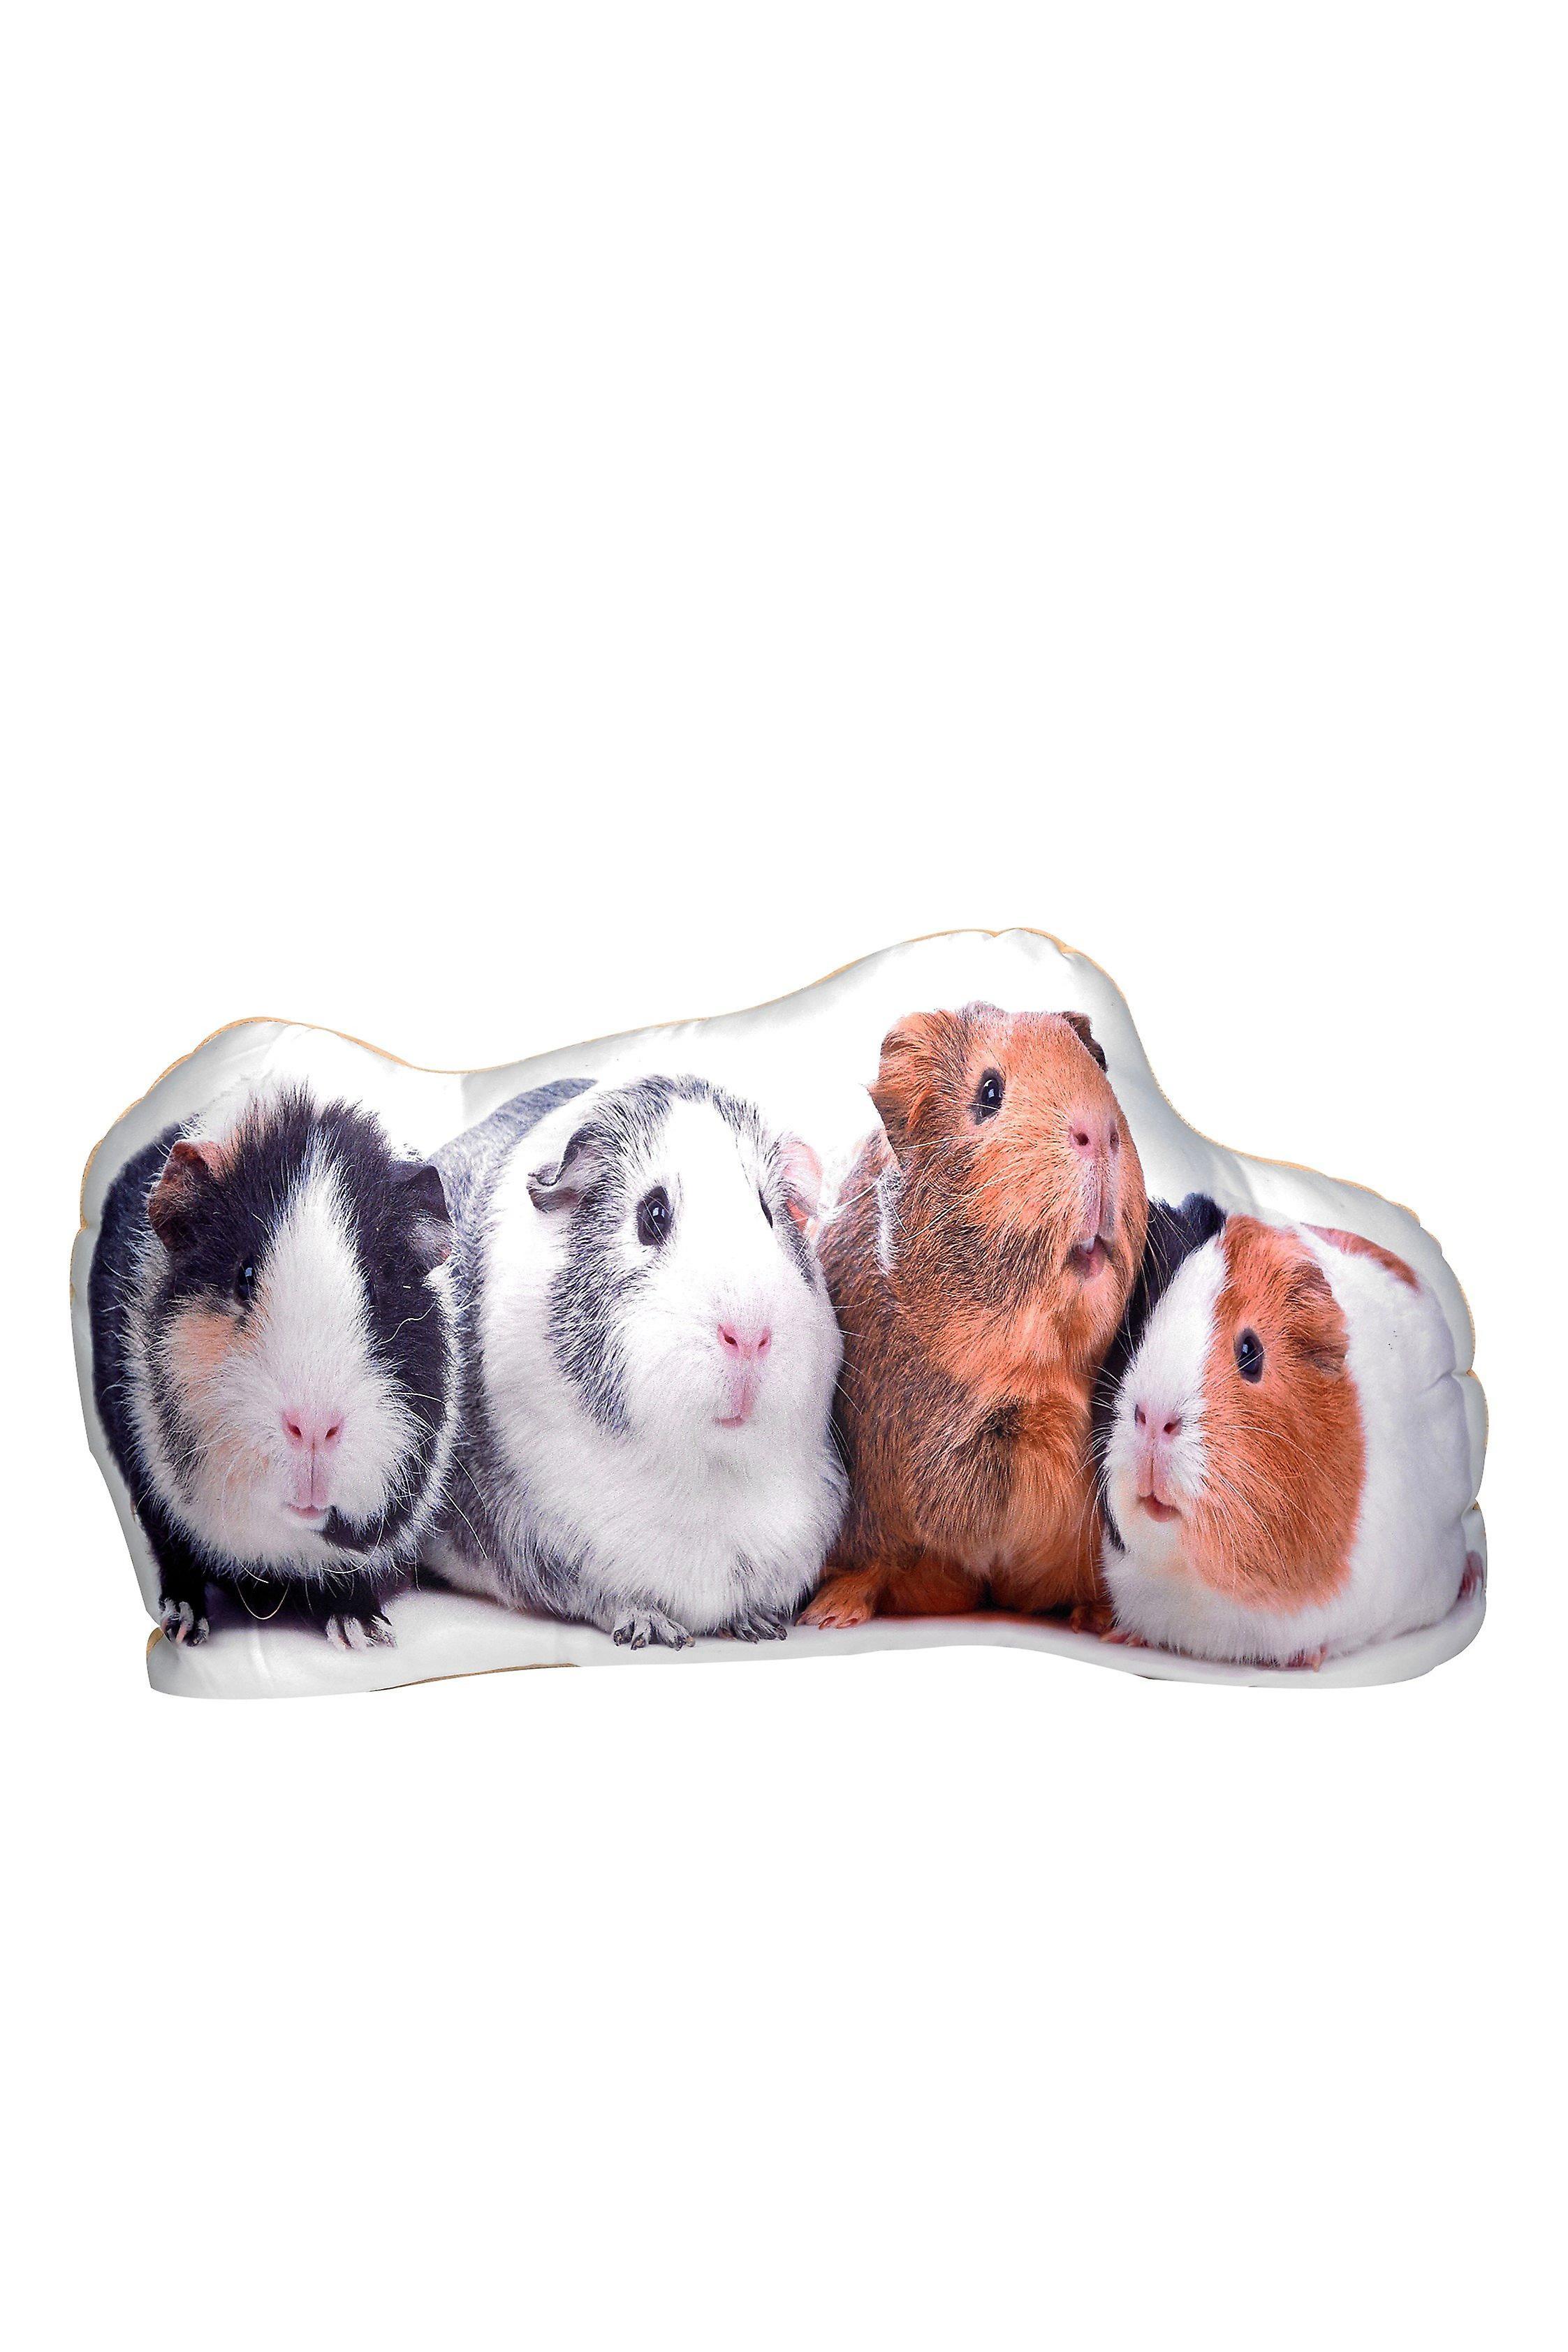 Adorable guinea pig shaped cushion